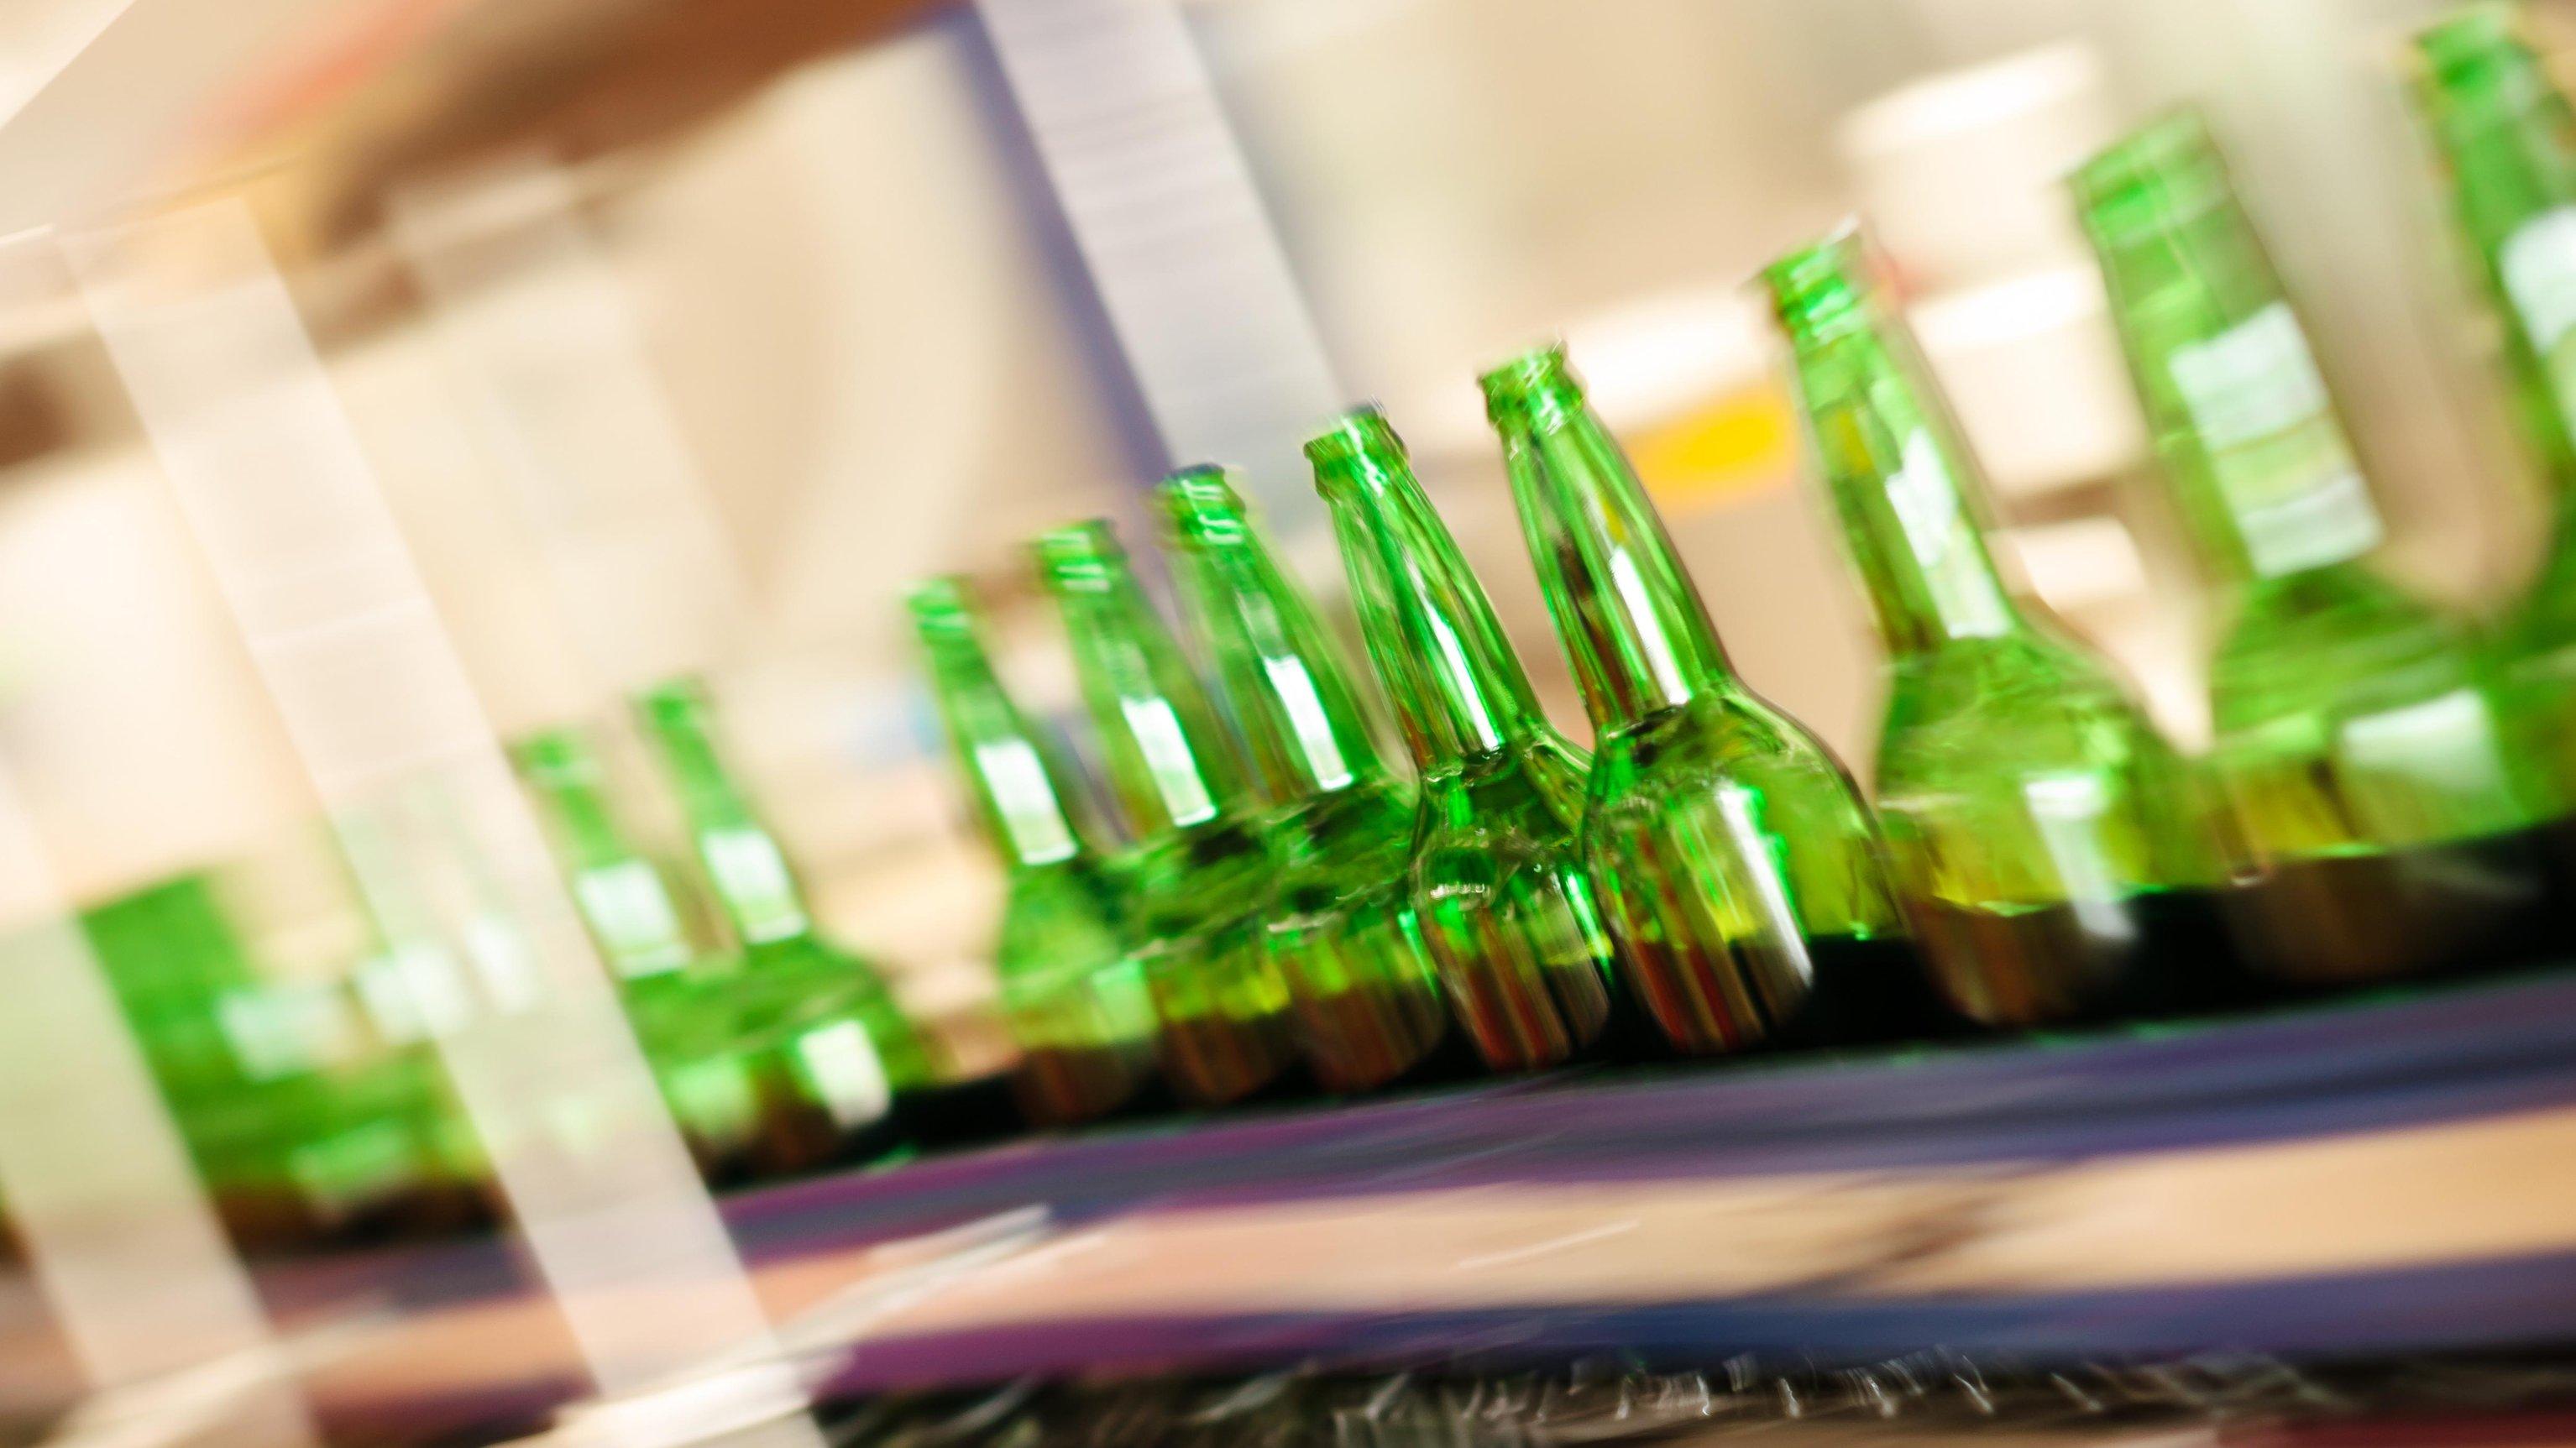 Stockfoto: Calvatis Flaschenreinigung - @ istock.com / RendyA